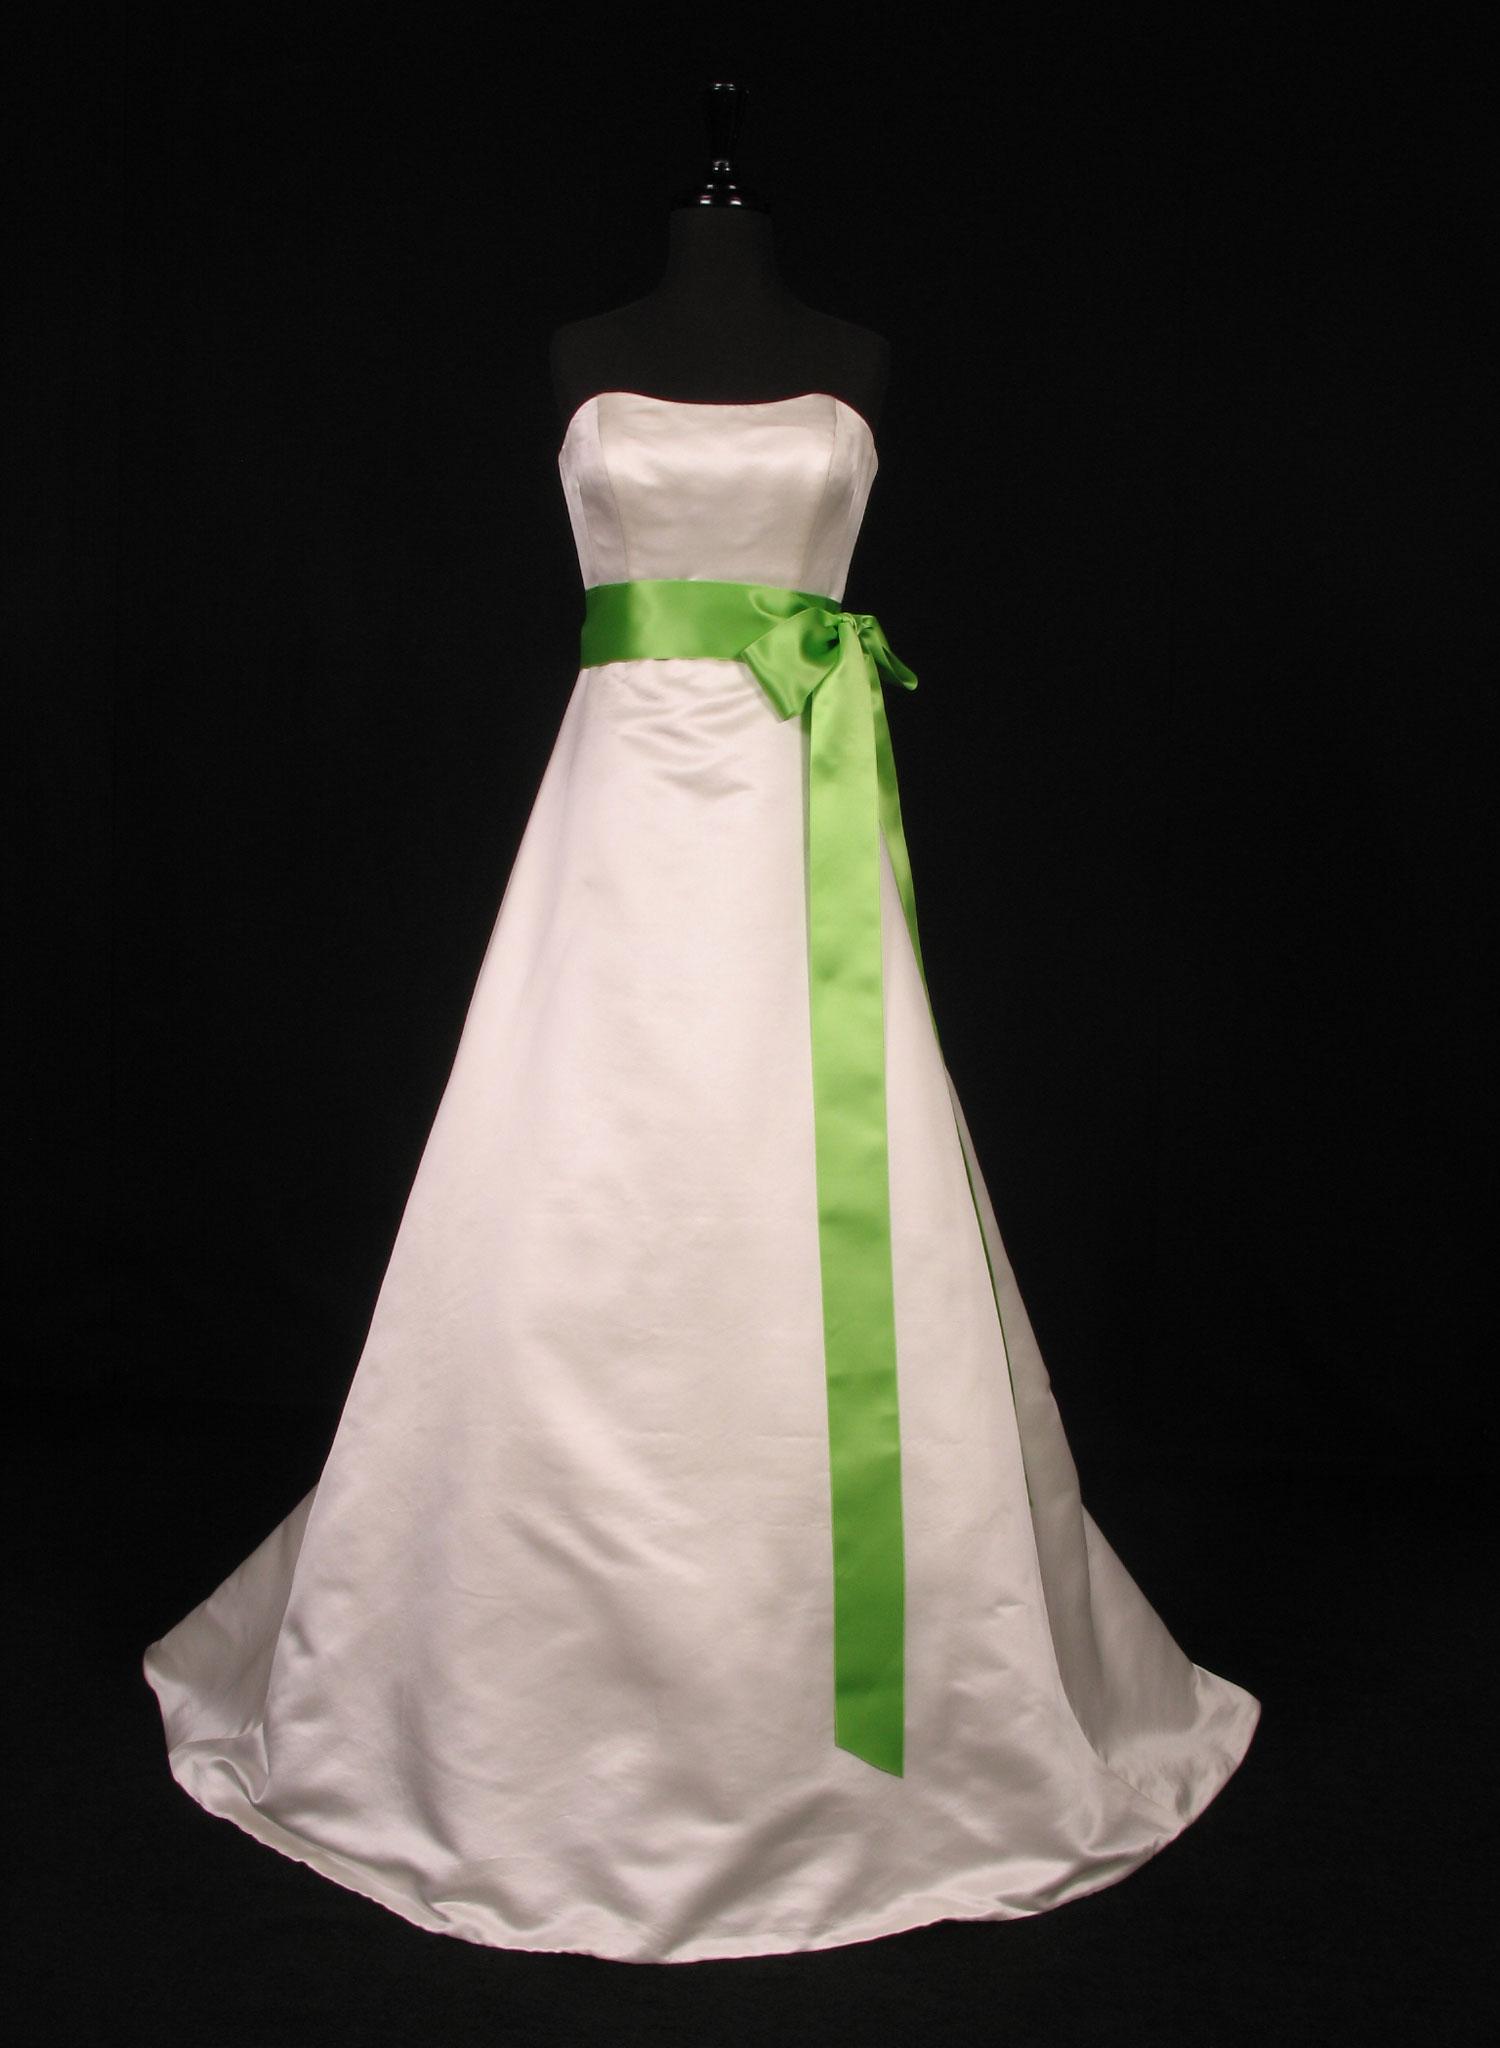 Wedding dress sashes for sale canada wedding dresses in for Sashes for wedding dresses